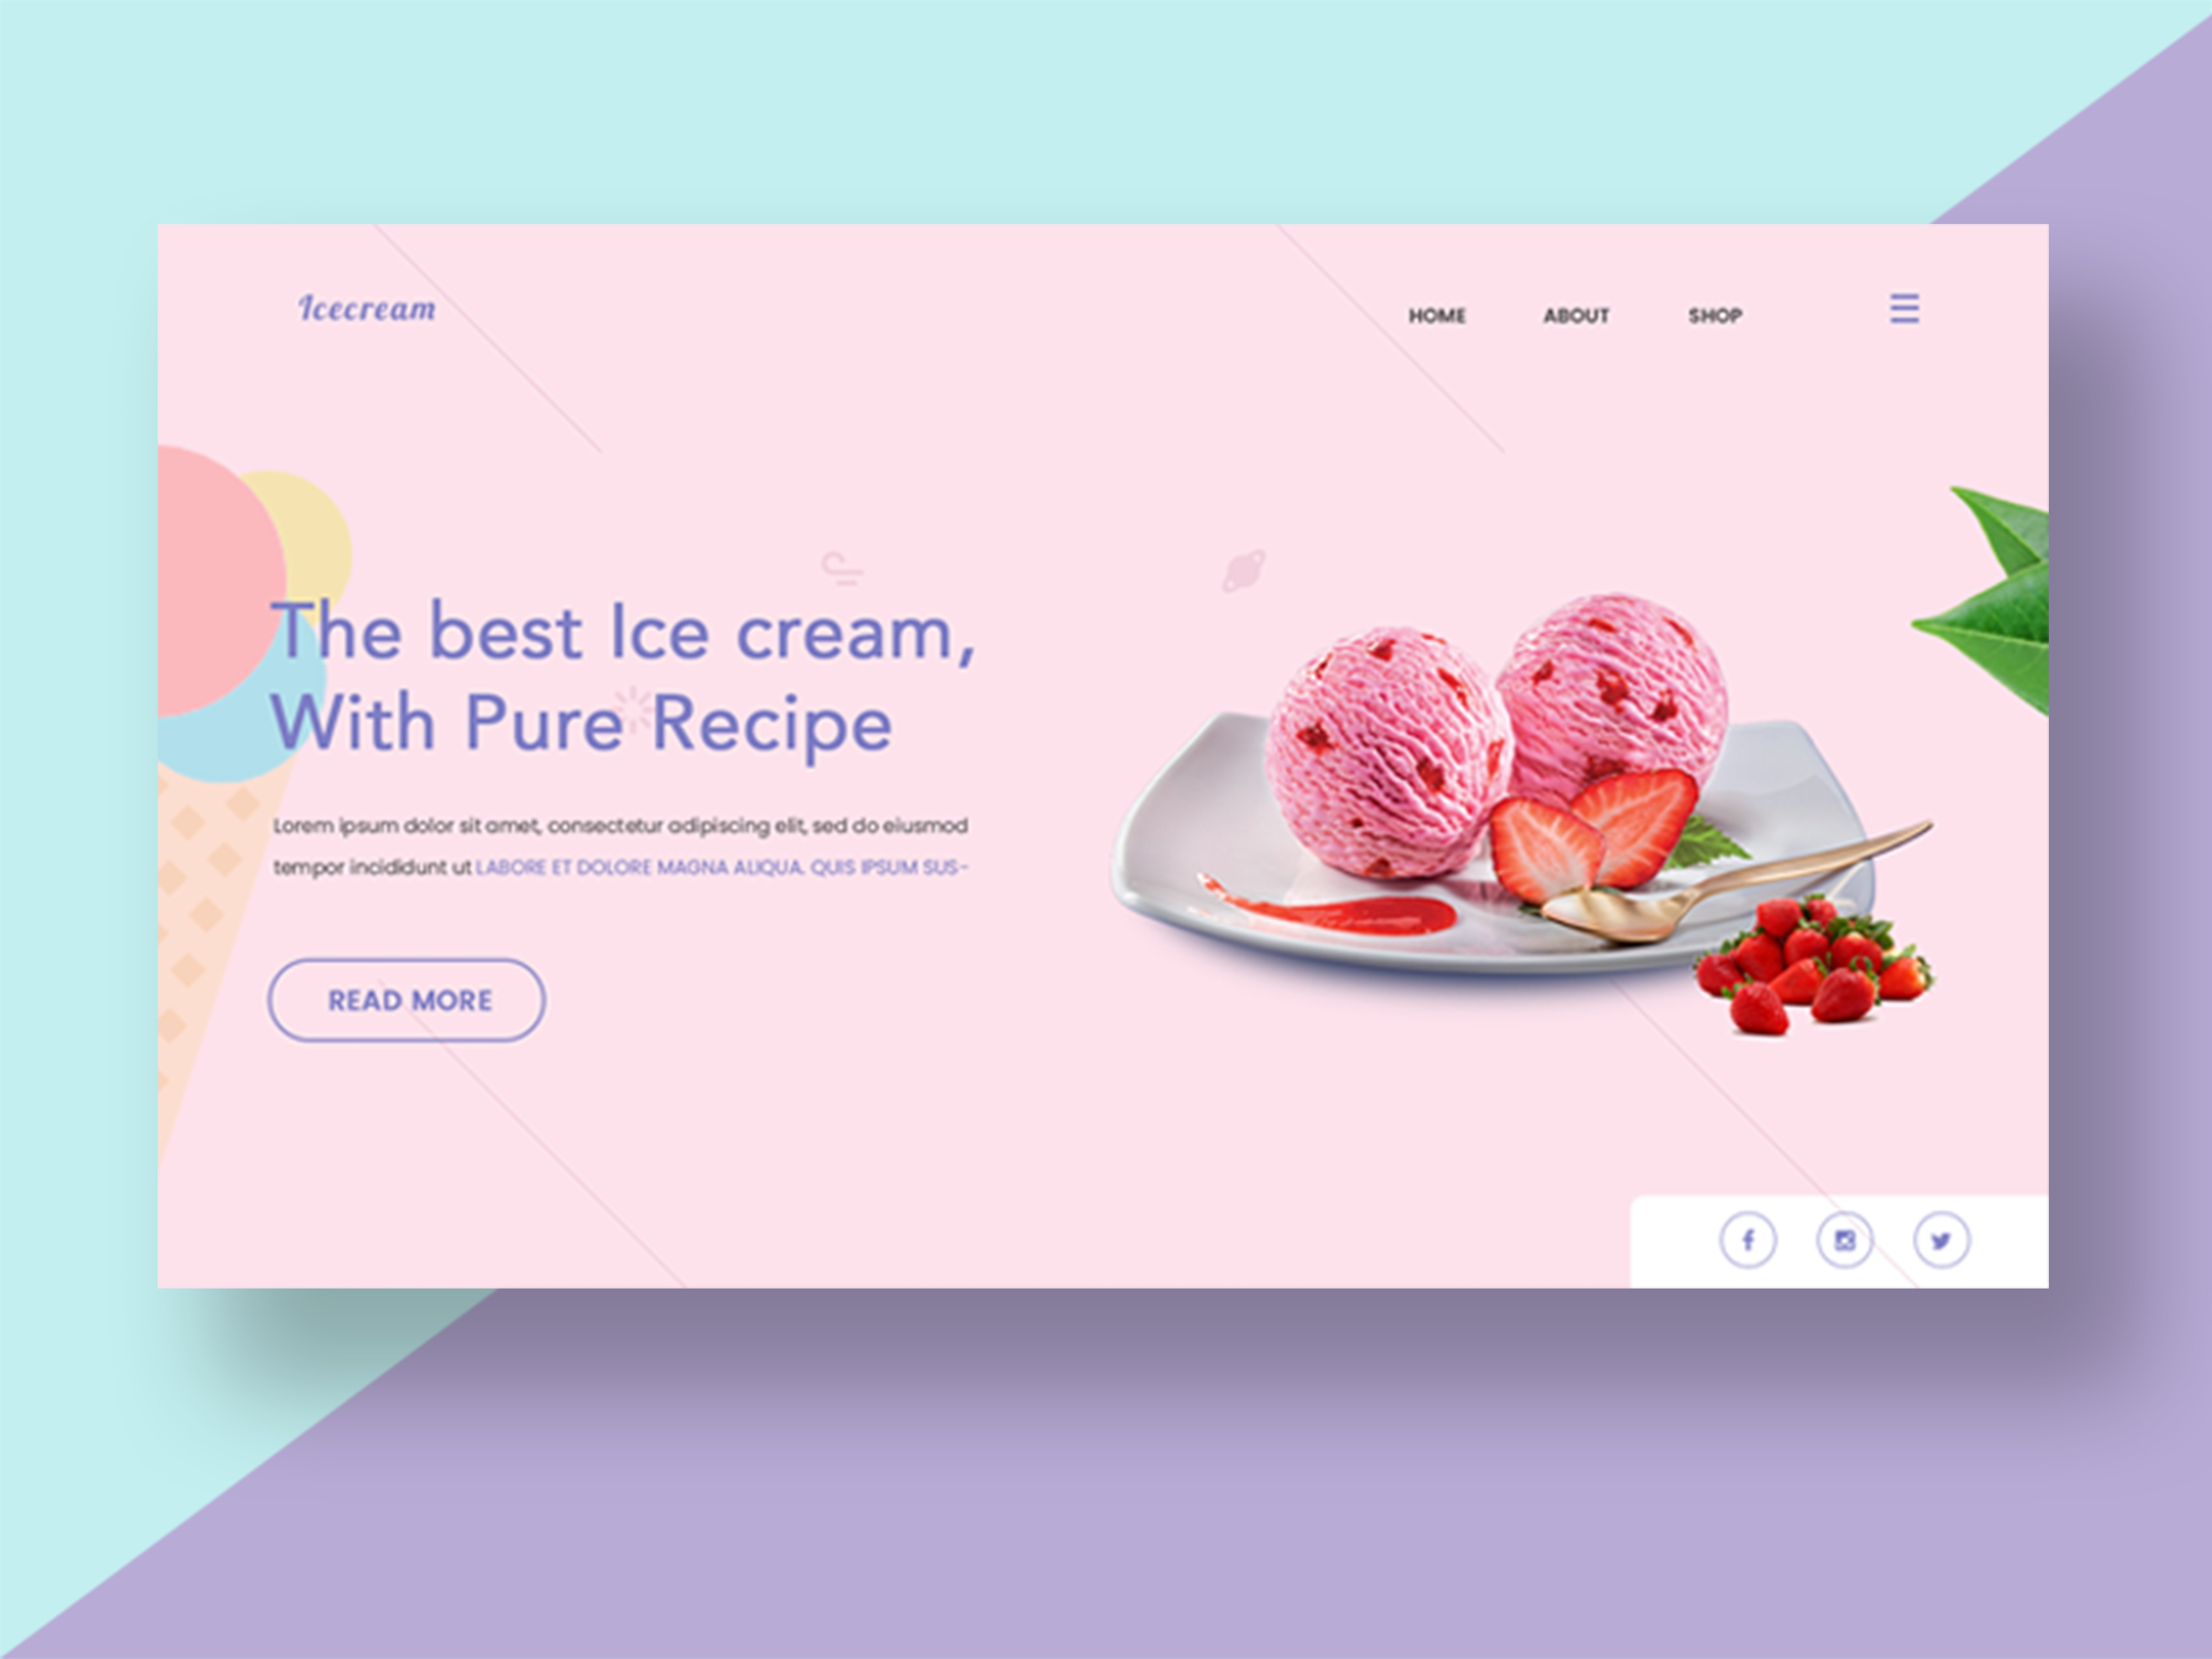 Gonofu Vectorize | Design Inspiration